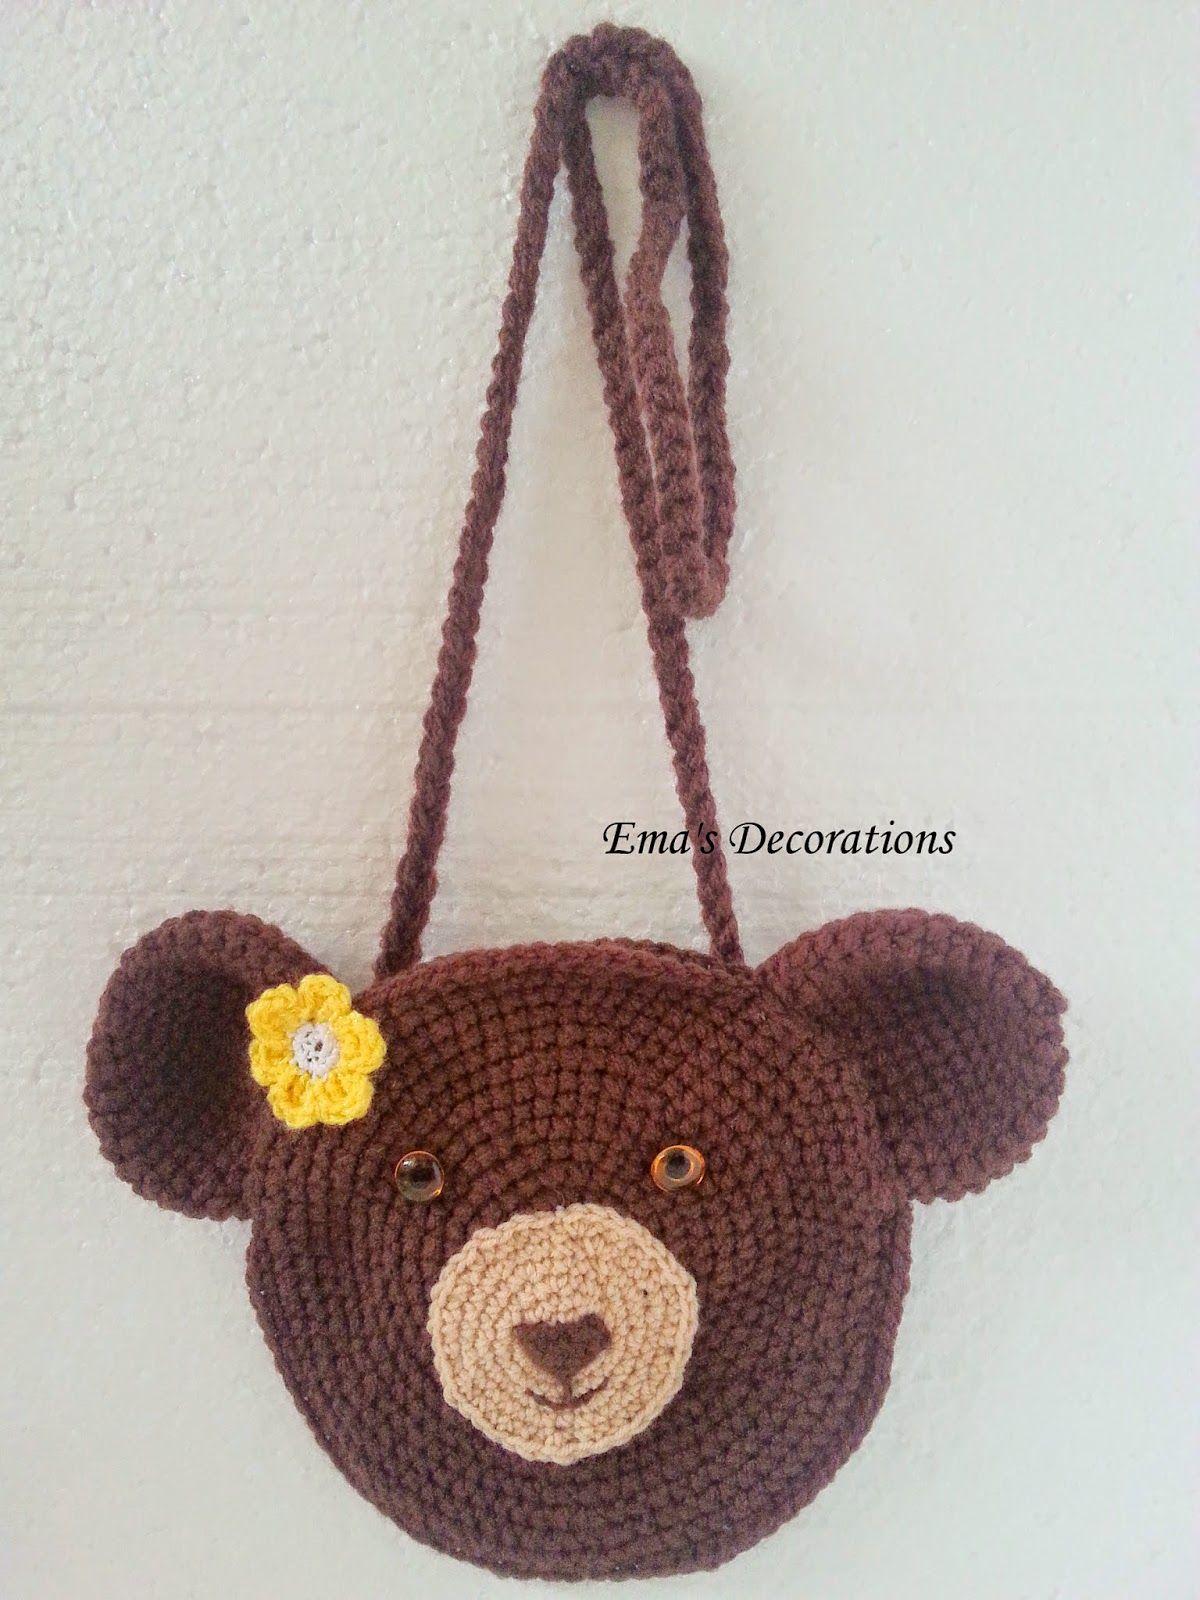 Emas Decorations Crochet Bear Bag Free Pattern Crochet Bags